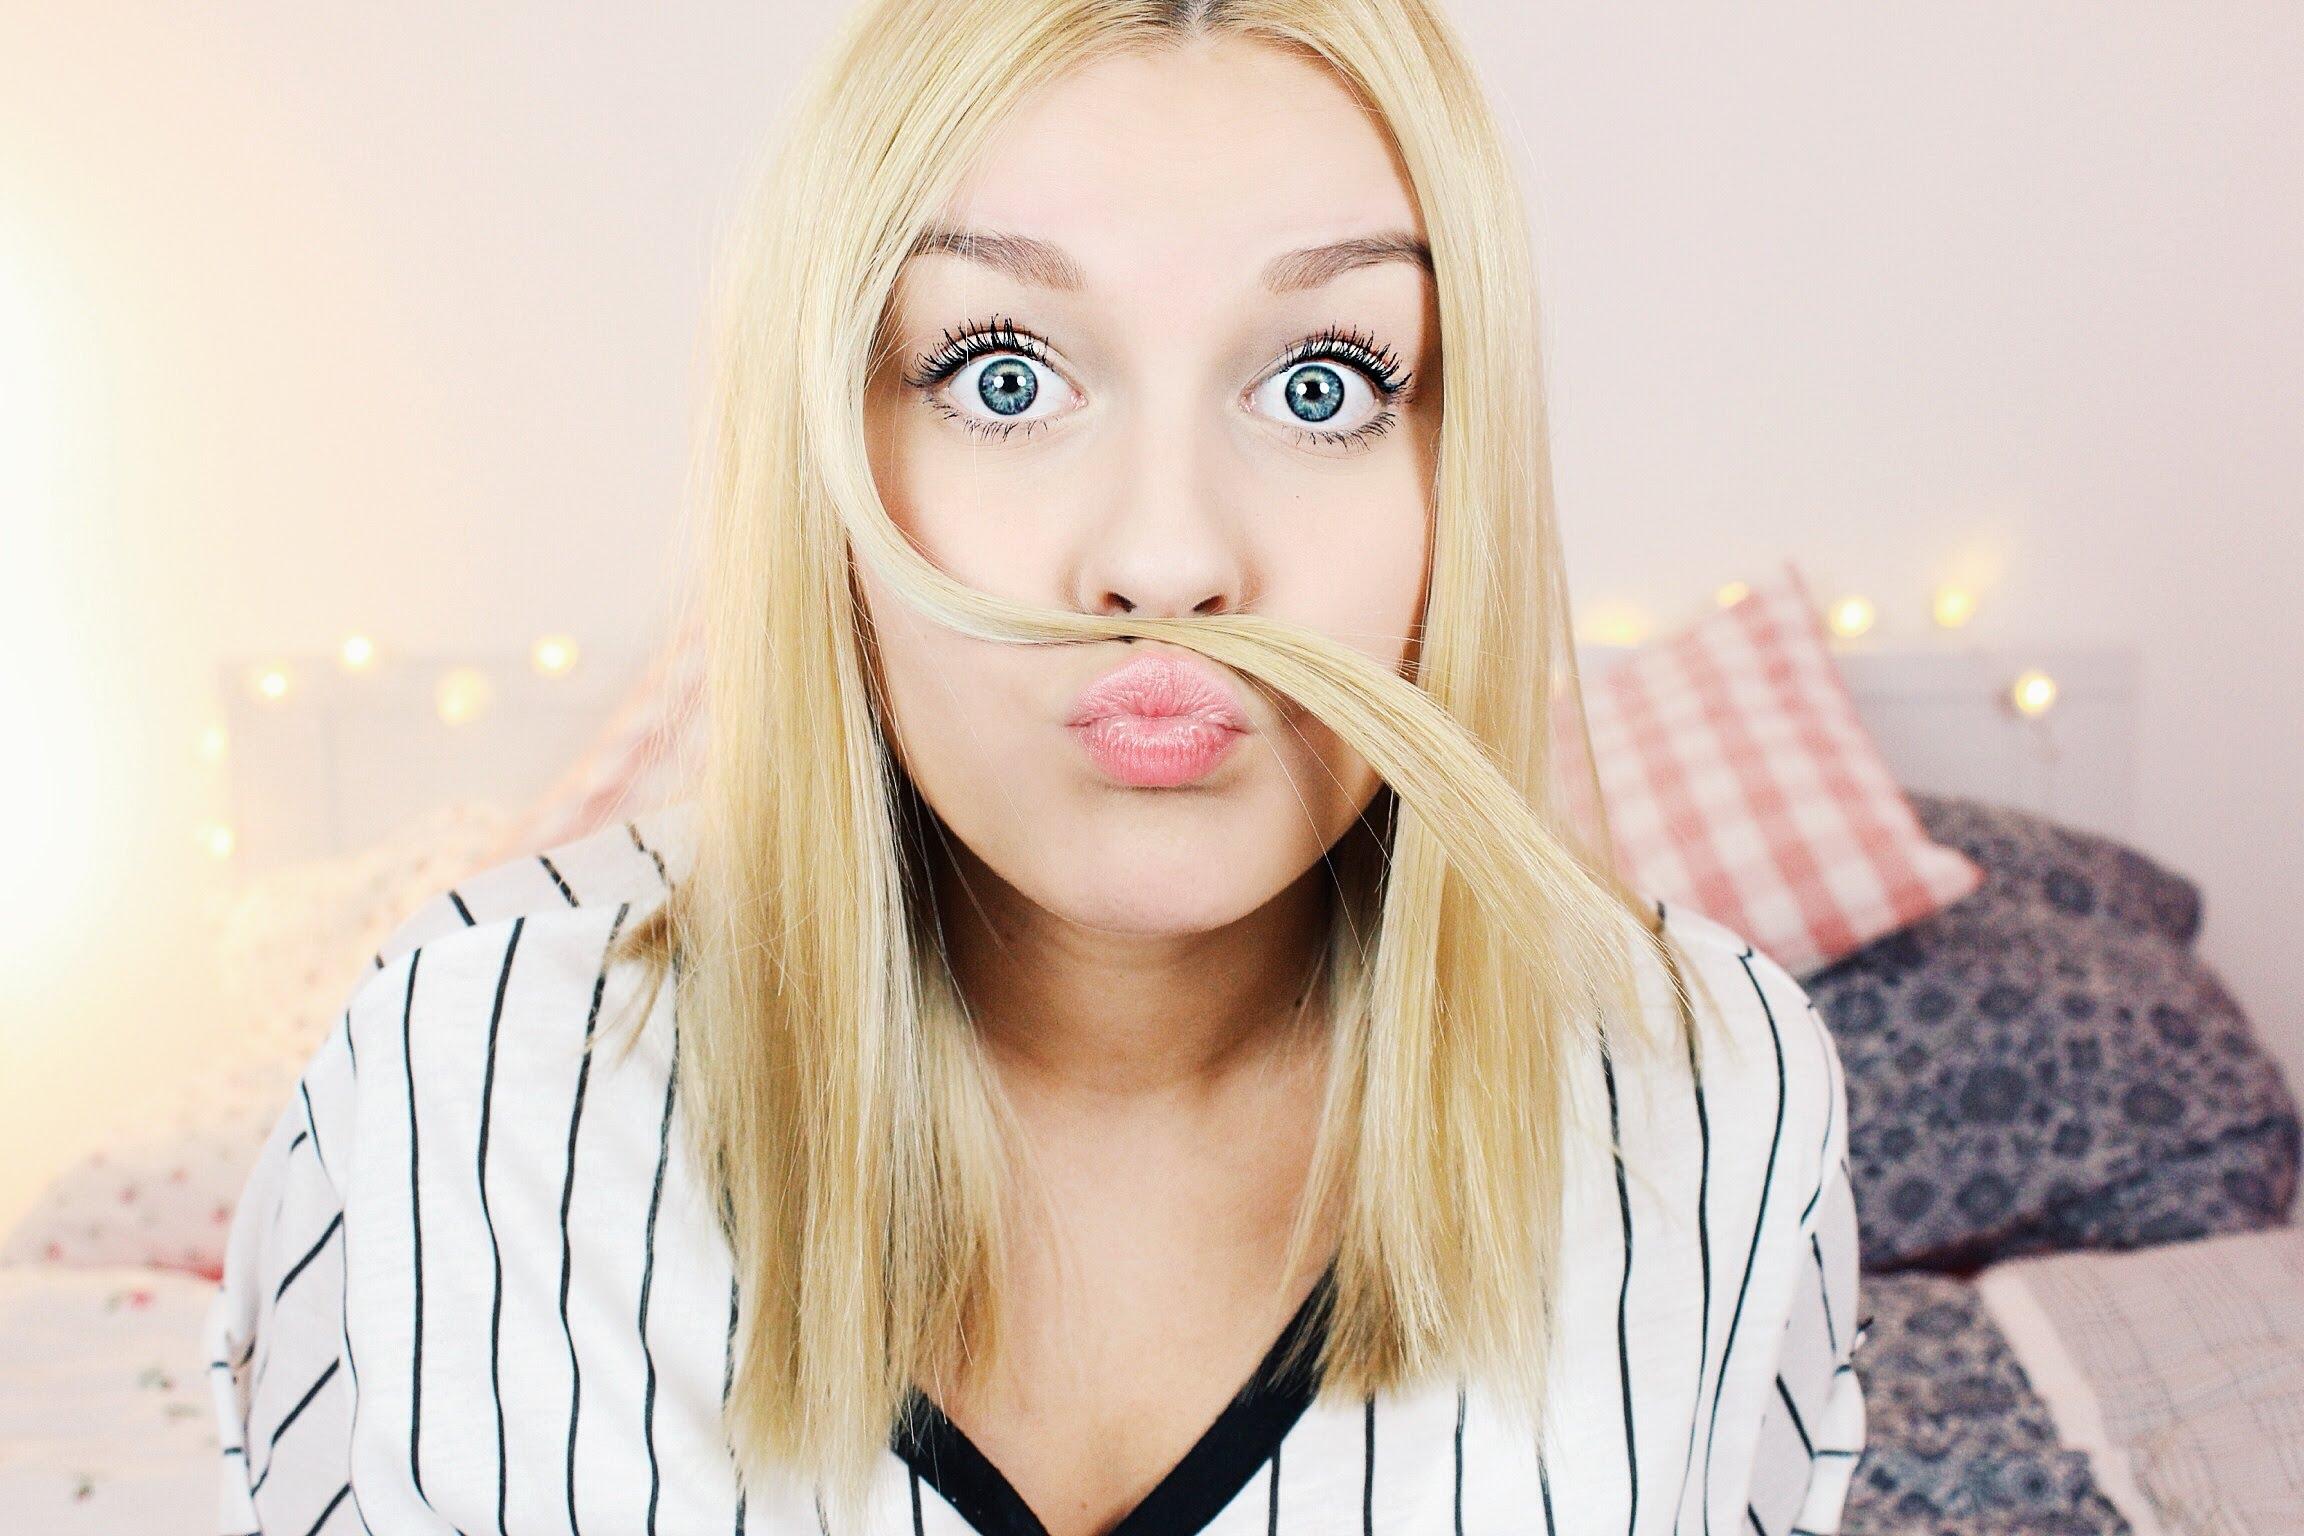 Web Video Star Dagi Bee - age: 26